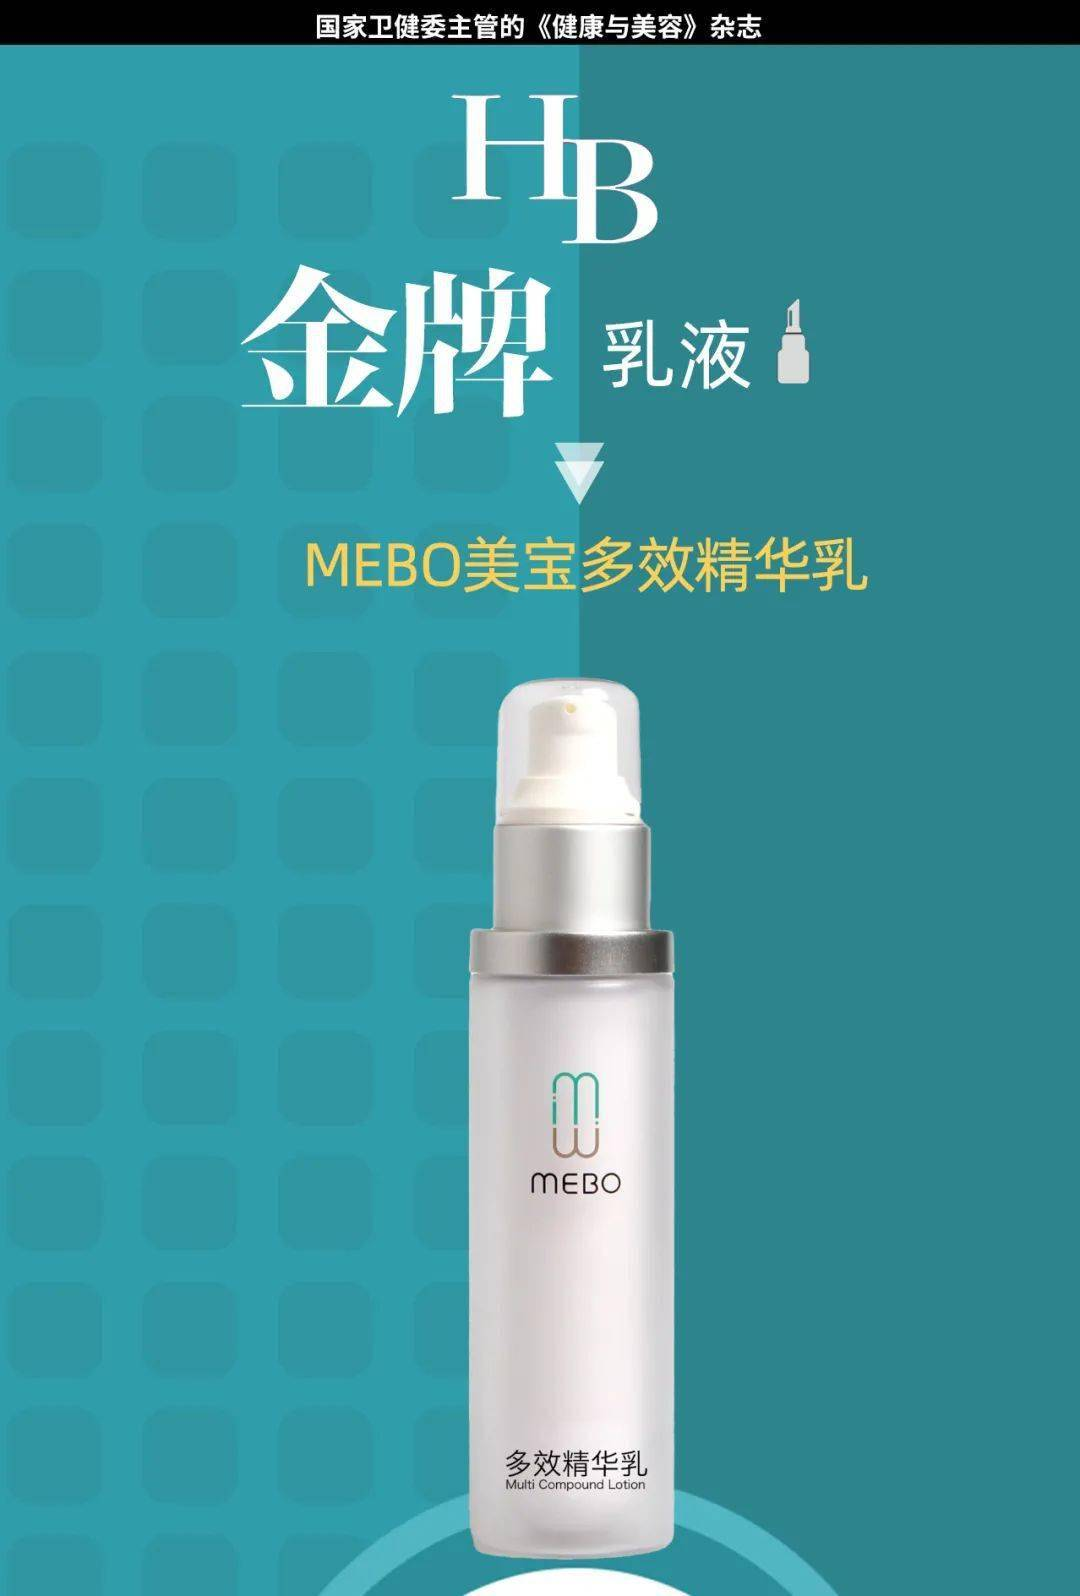 HB年度金牌乳液丨MEBO美宝多效精华乳